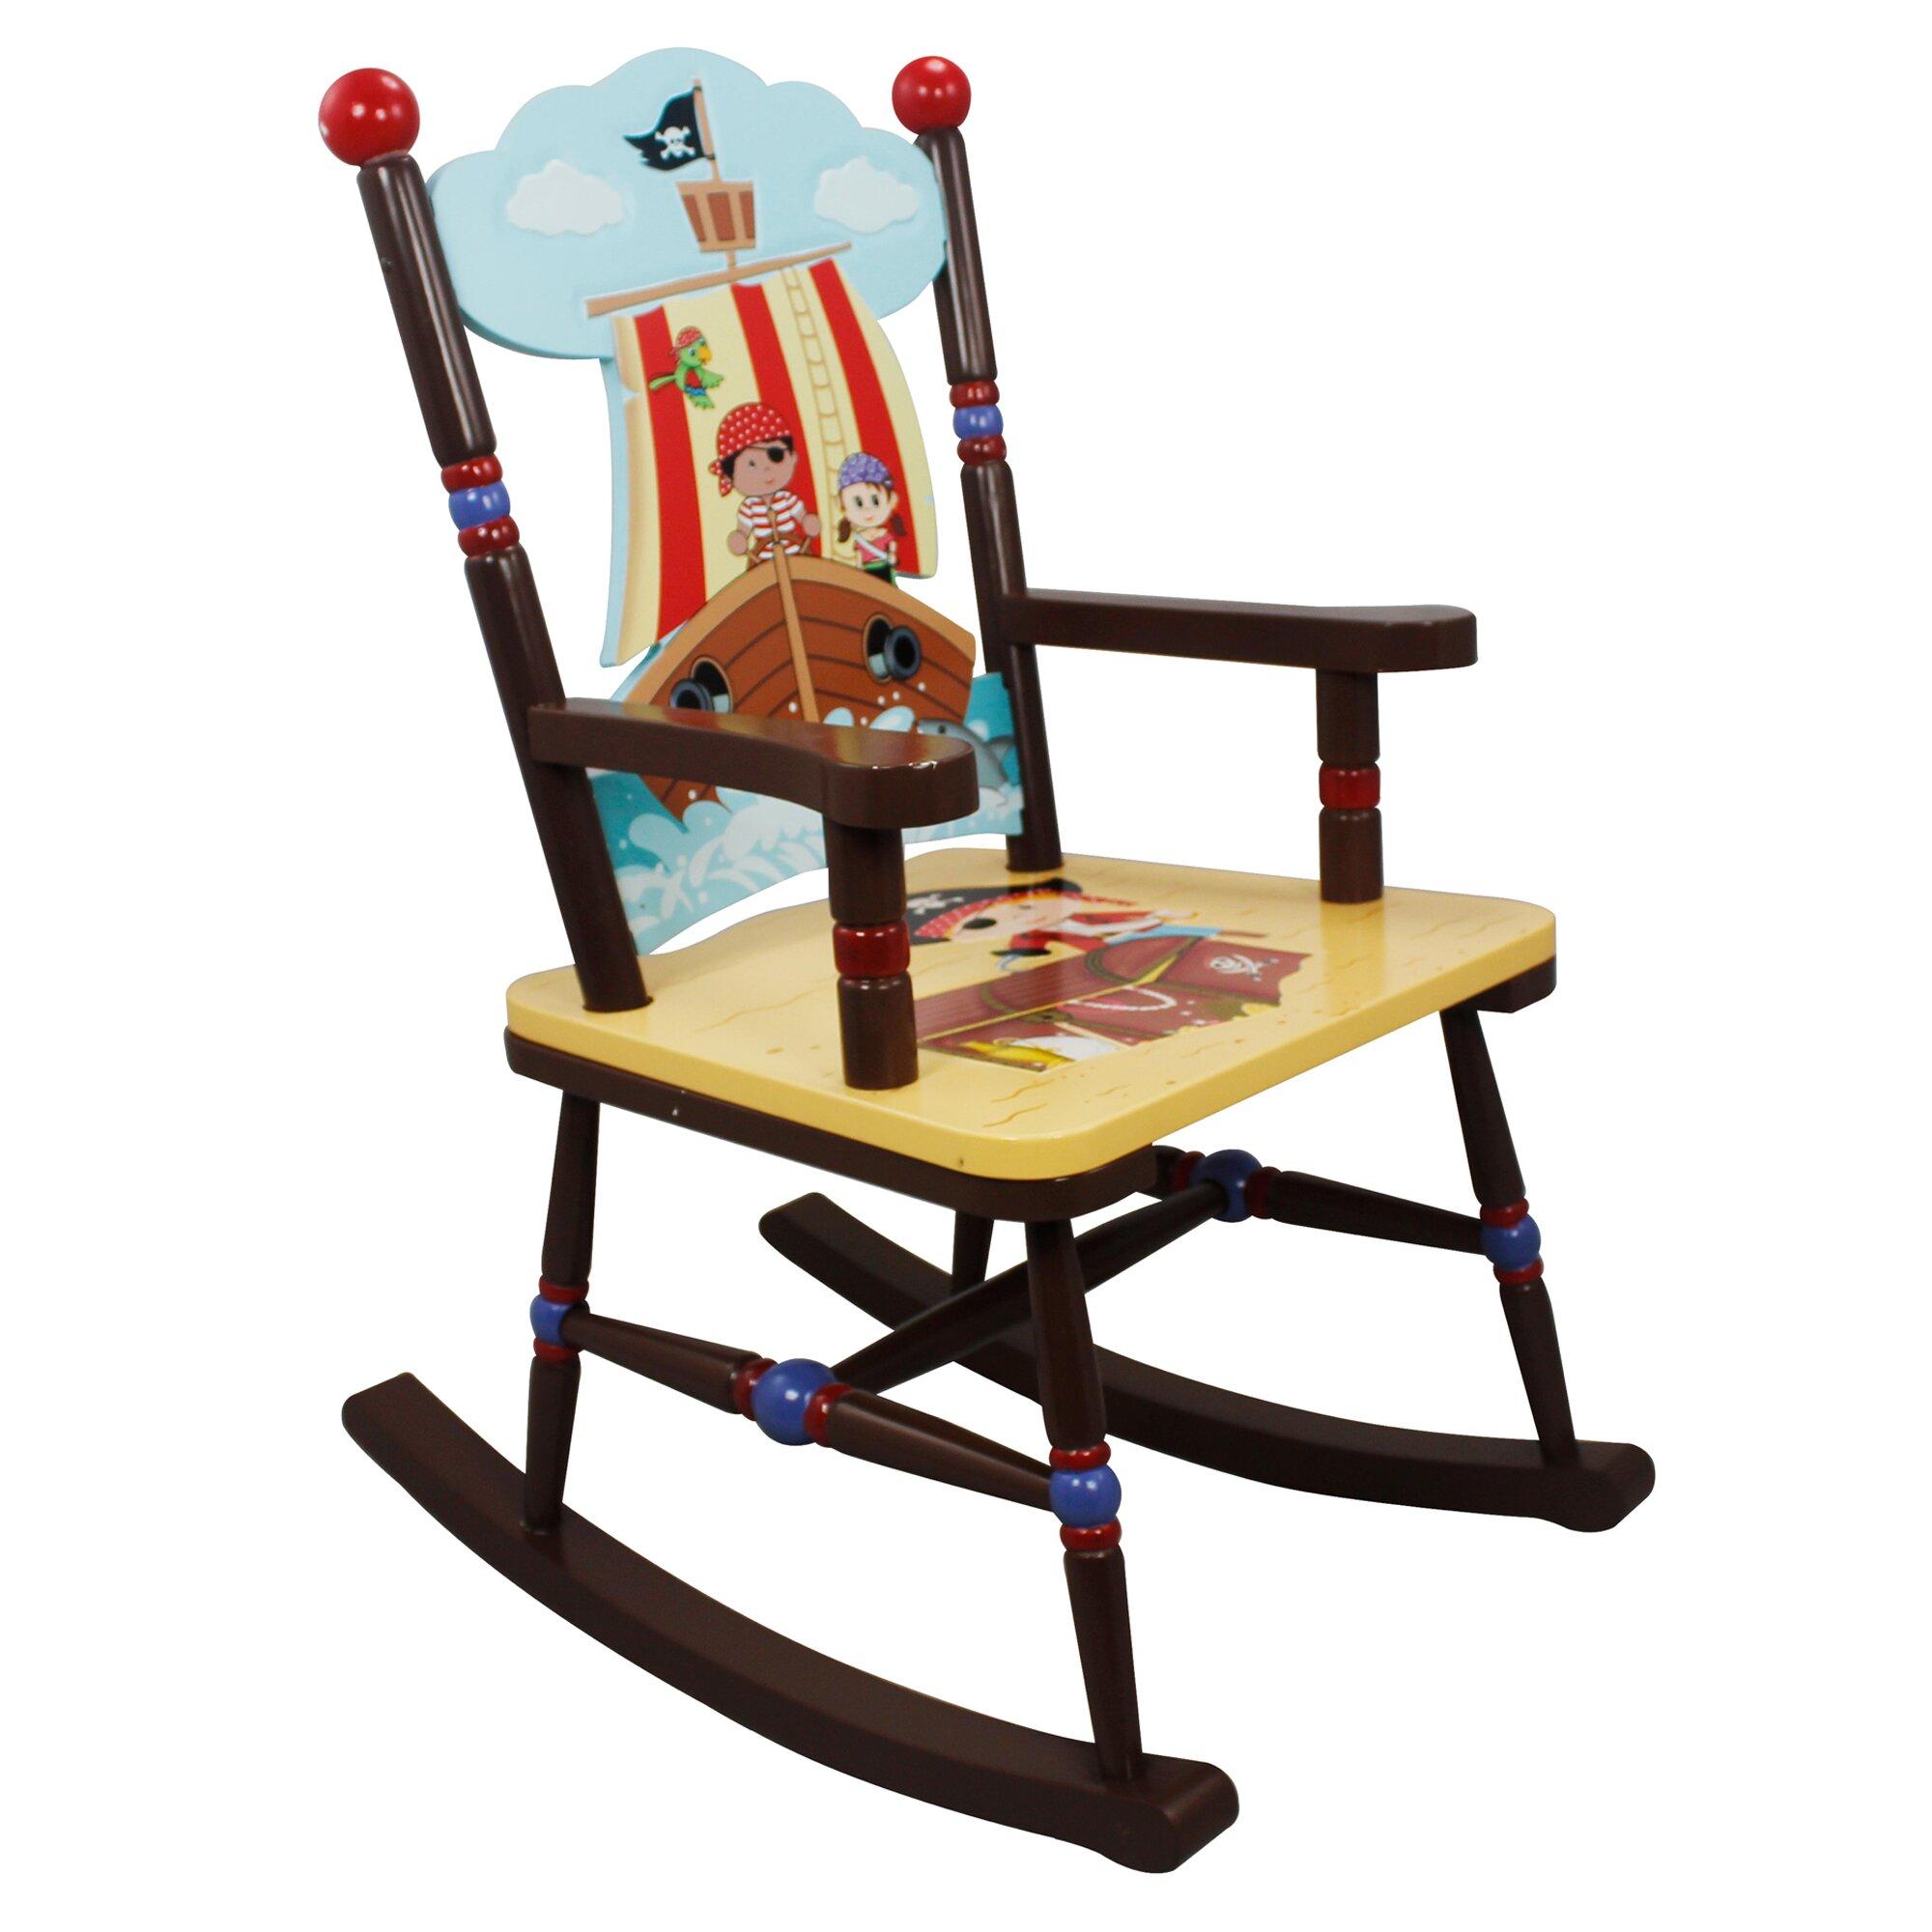 Pirates Island Kids Rocking Chair by Fantasy Fields